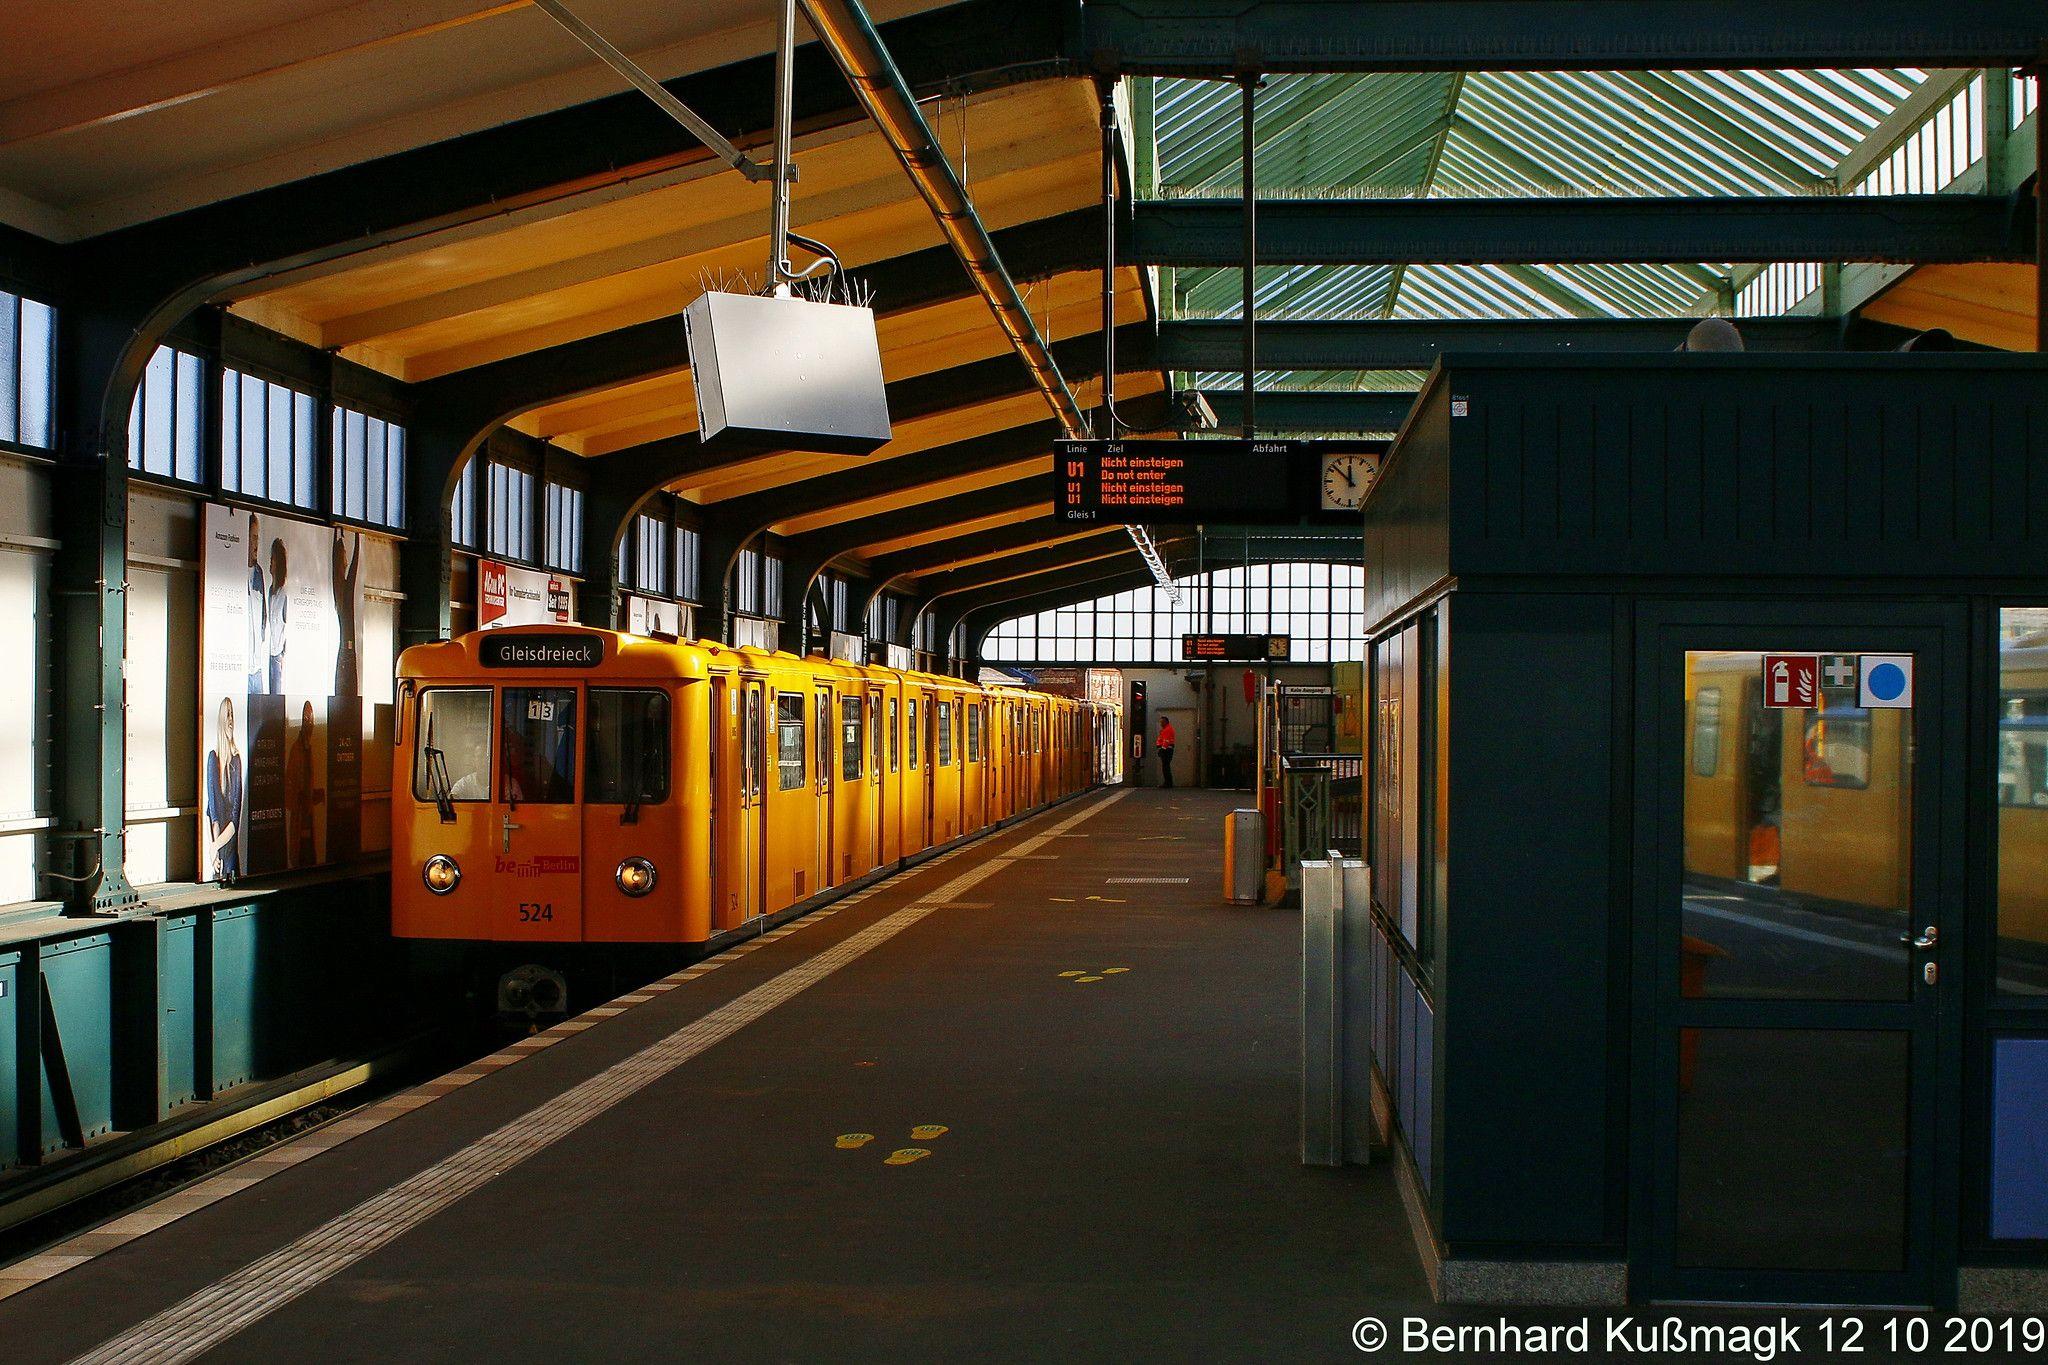 Europa Deutschland Berlin Friedrichshain Kreuzberg Kreuzberg U Bahnhof Gleisdreieck U Bahn Linie U1 Berlin Germany Ho Trains